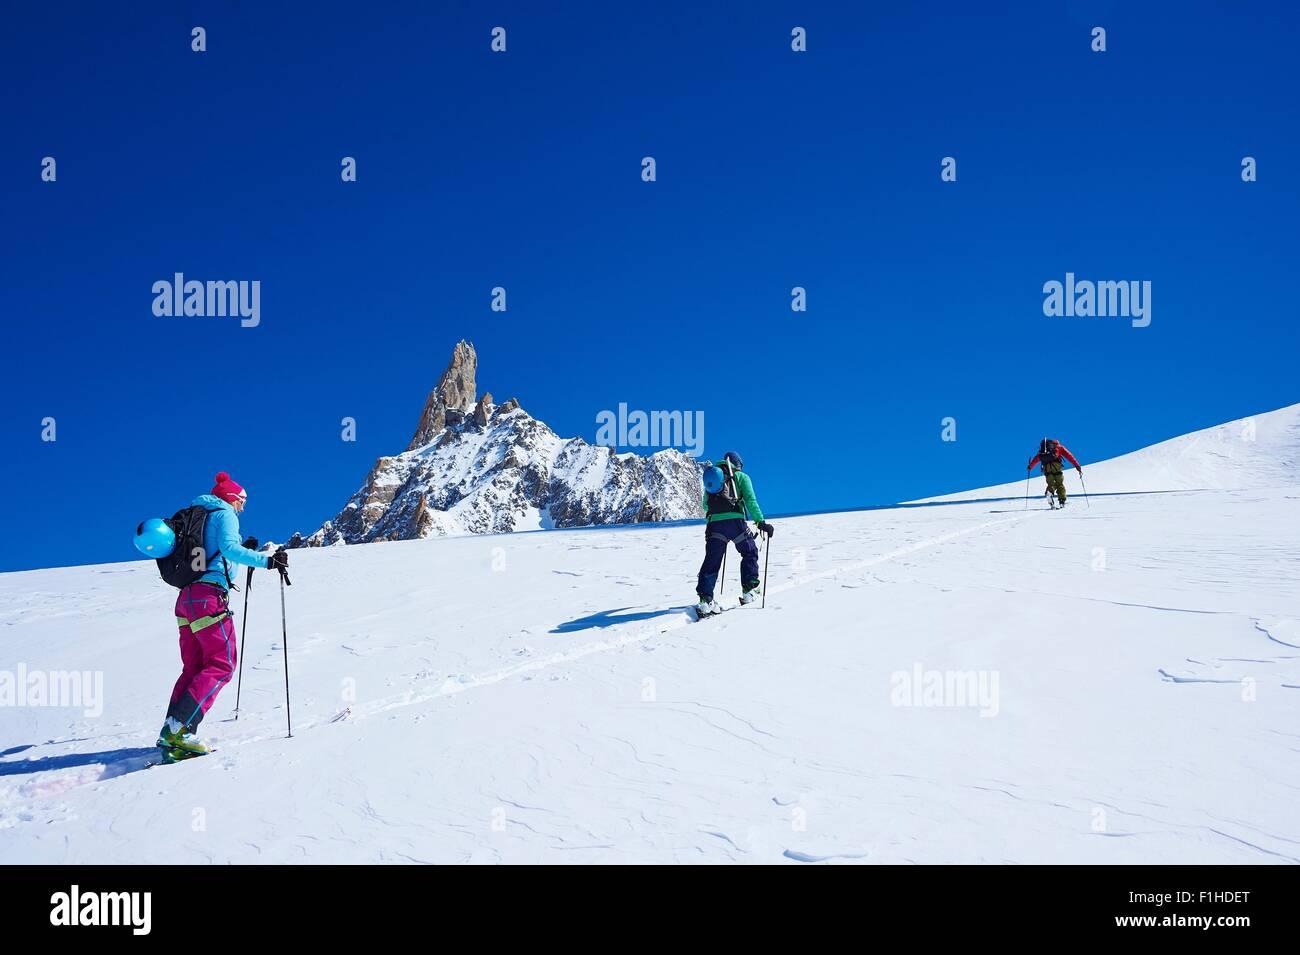 Tres adultos esquiadores subiendo Graian macizo del Mont Blanc, Alpes, Francia Imagen De Stock